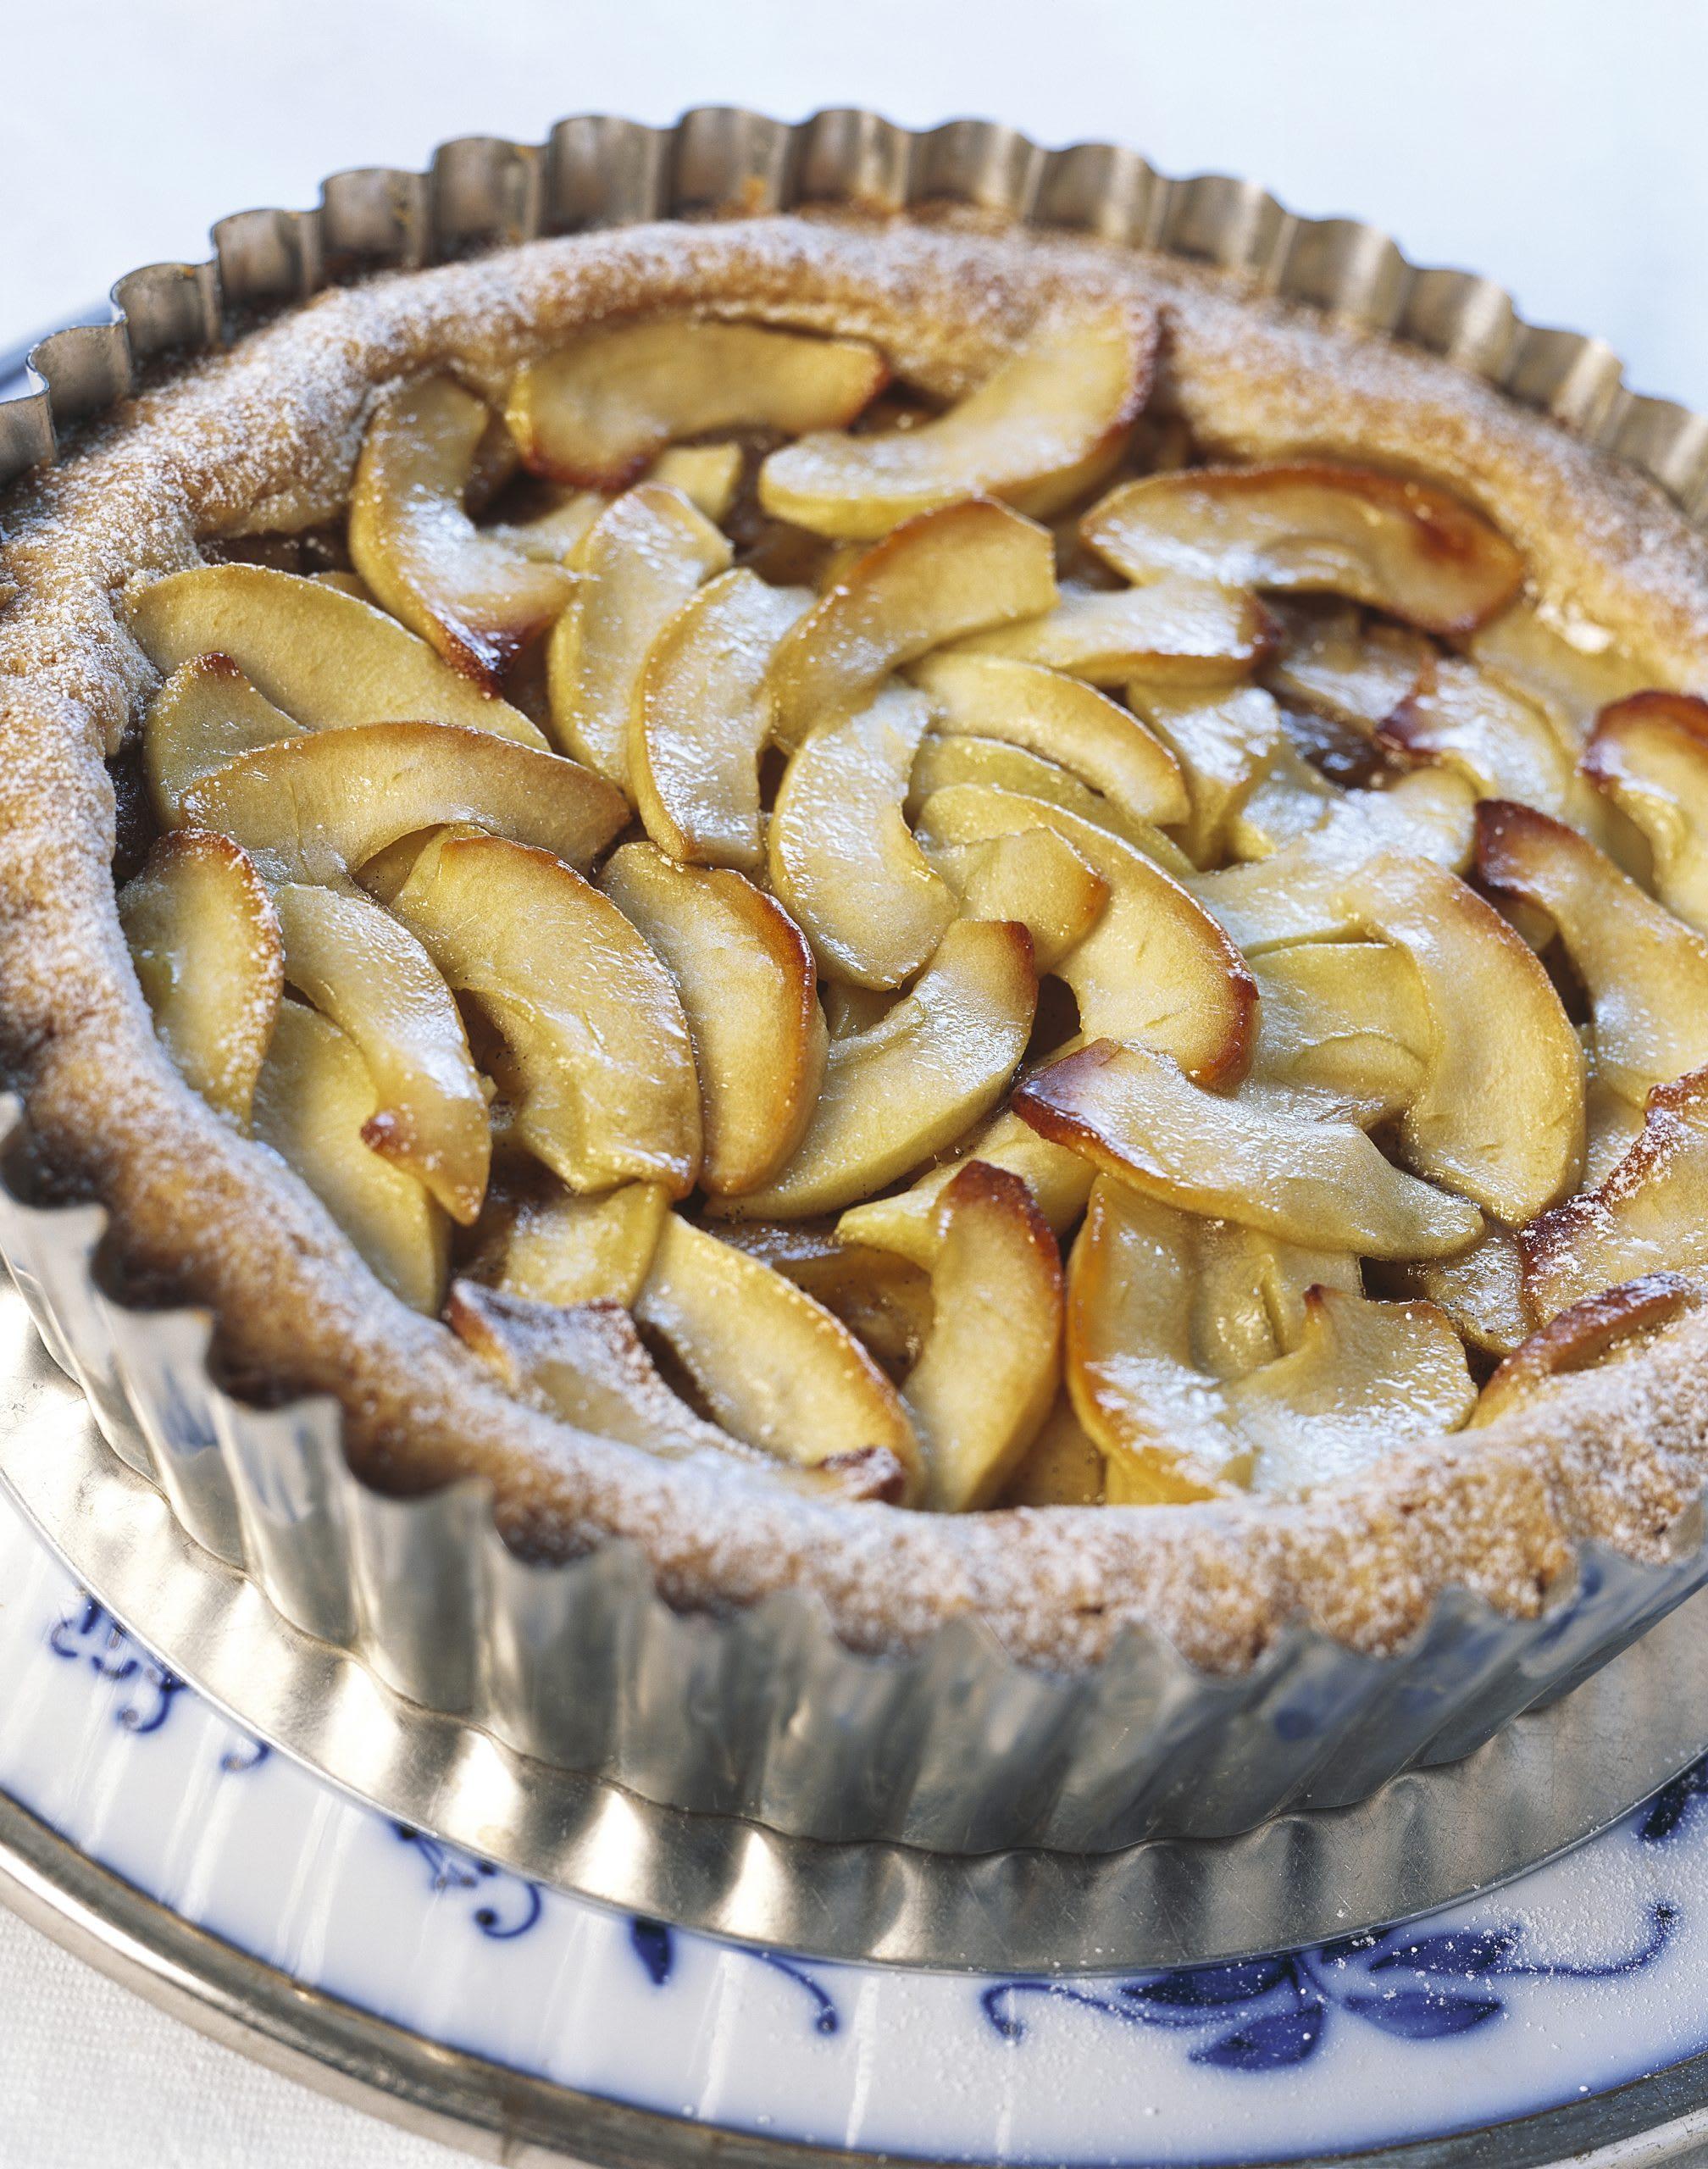 Tarte aux pommes vanillées